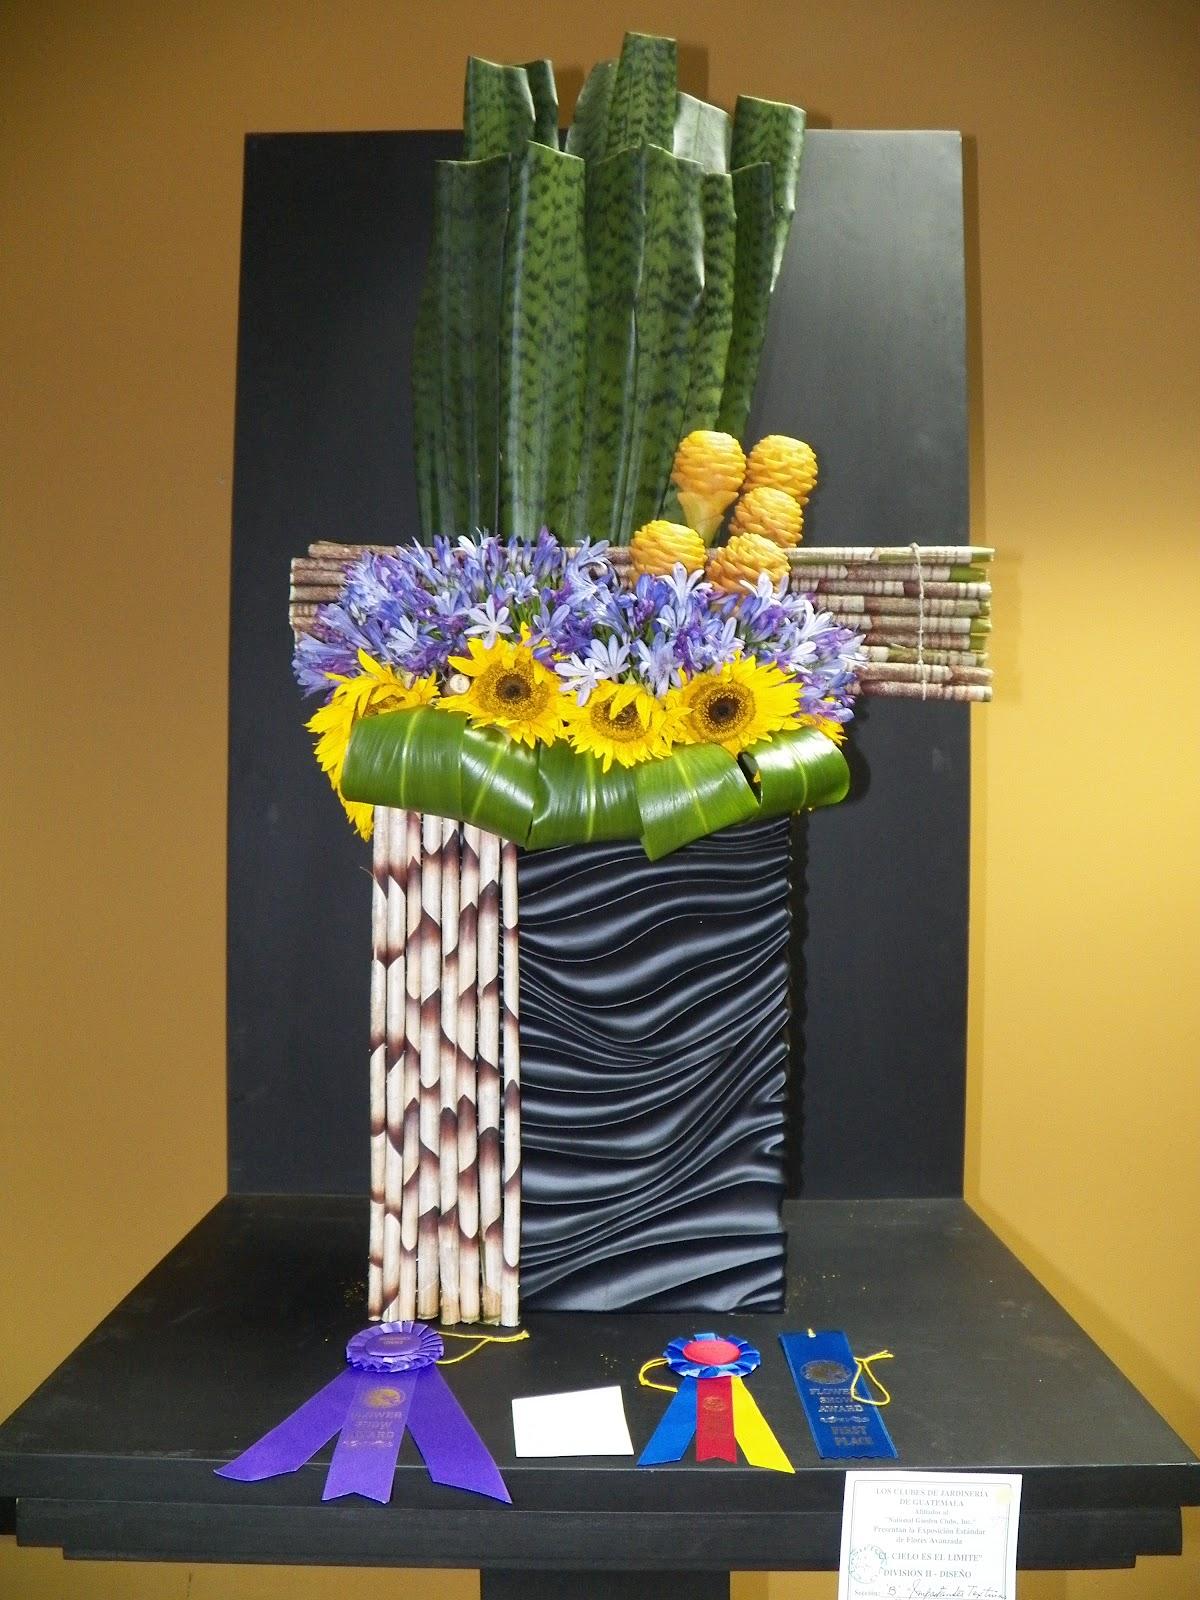 Arreglos florales creativos dise o tapiz - Arreglos florales creativos ...